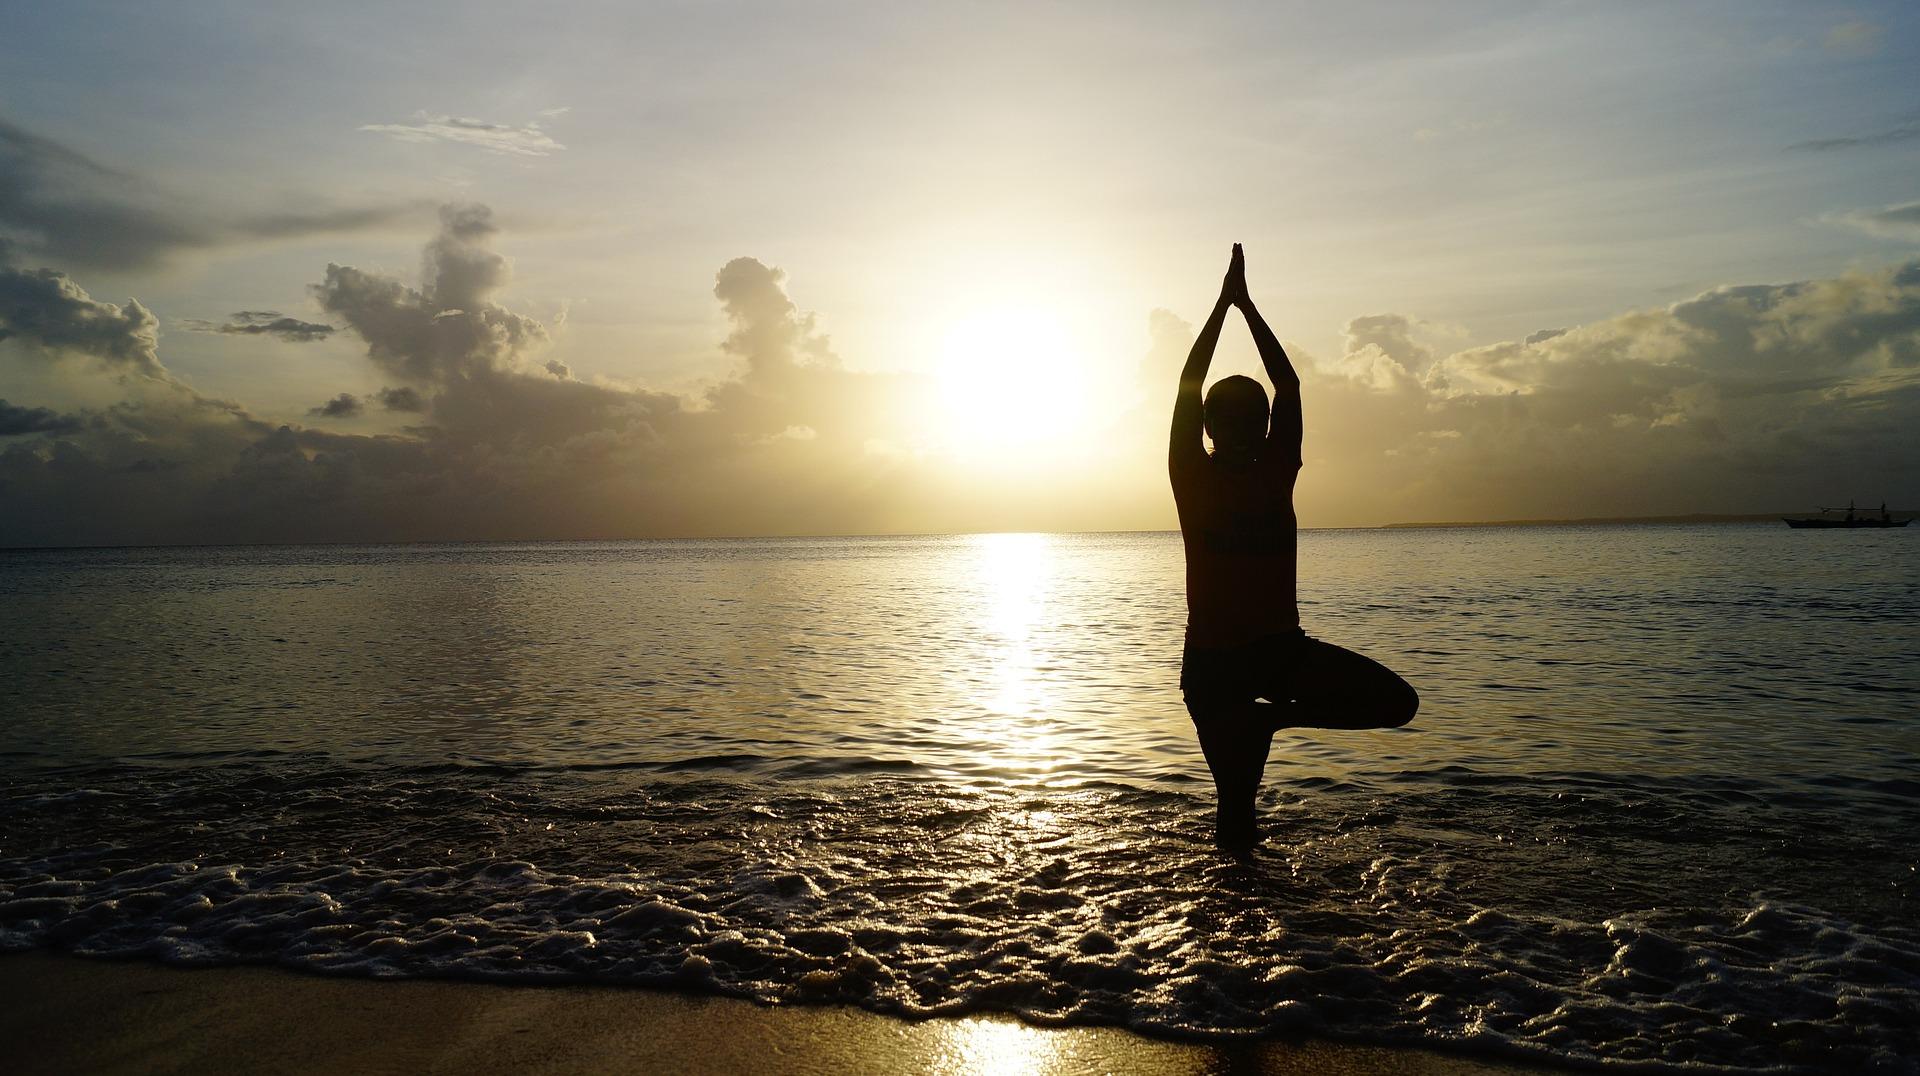 """ Beach Sunset Yoga "" by Pexels via Pixabay (Public Domain)"